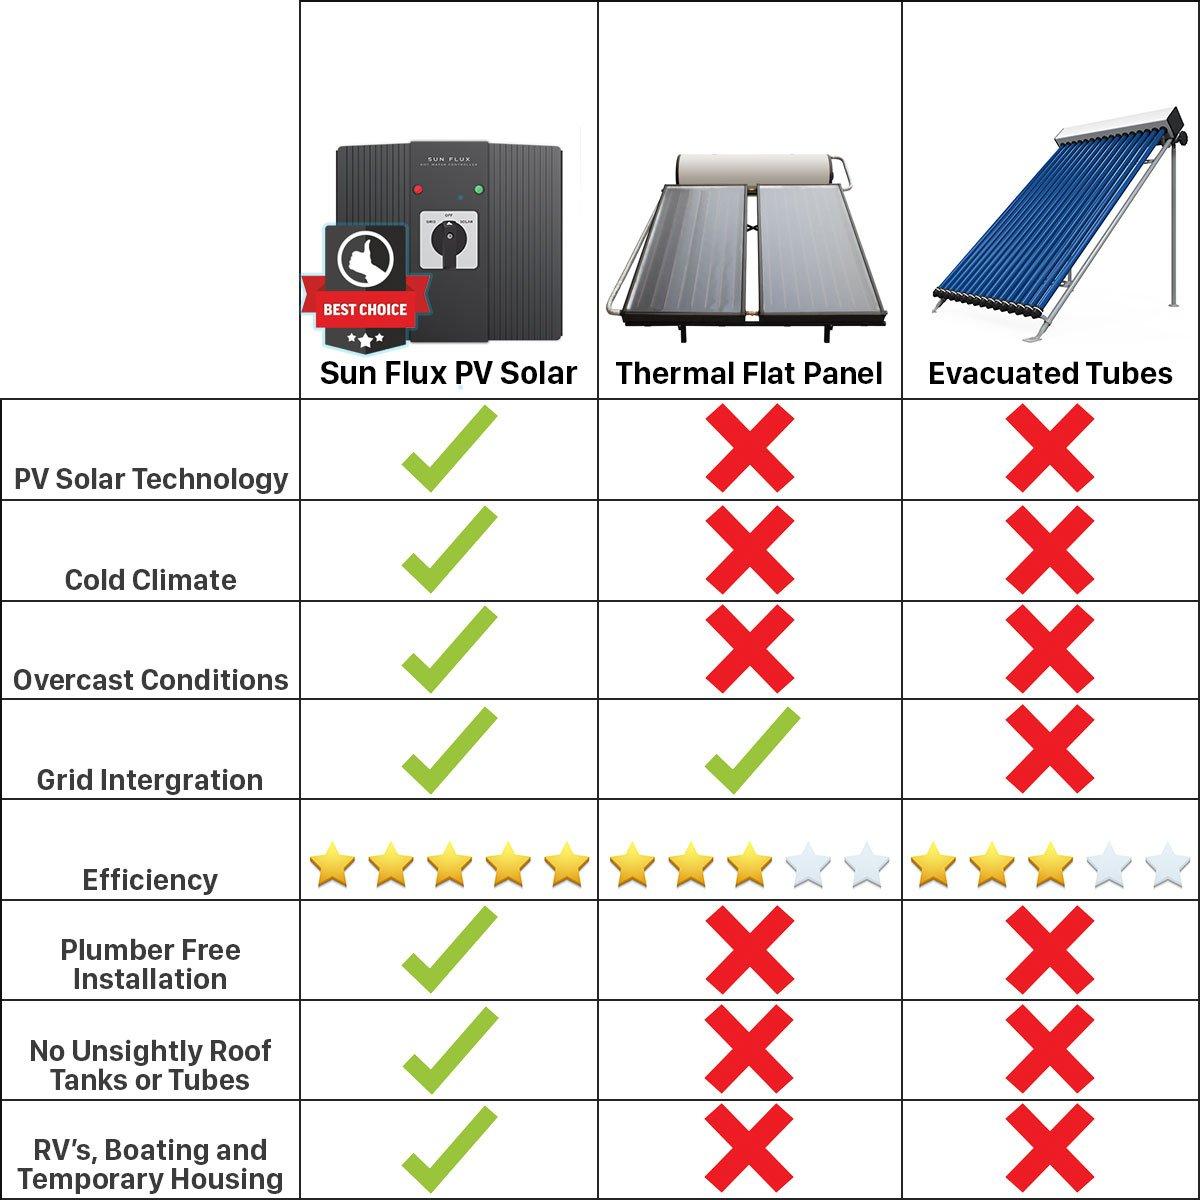 Agua caliente solar controlador - sol flujo por Sei (nuevo para 2017) | paneles solares + sol Flux + eléctrico calentador de agua depósito, hacer libre agua ...